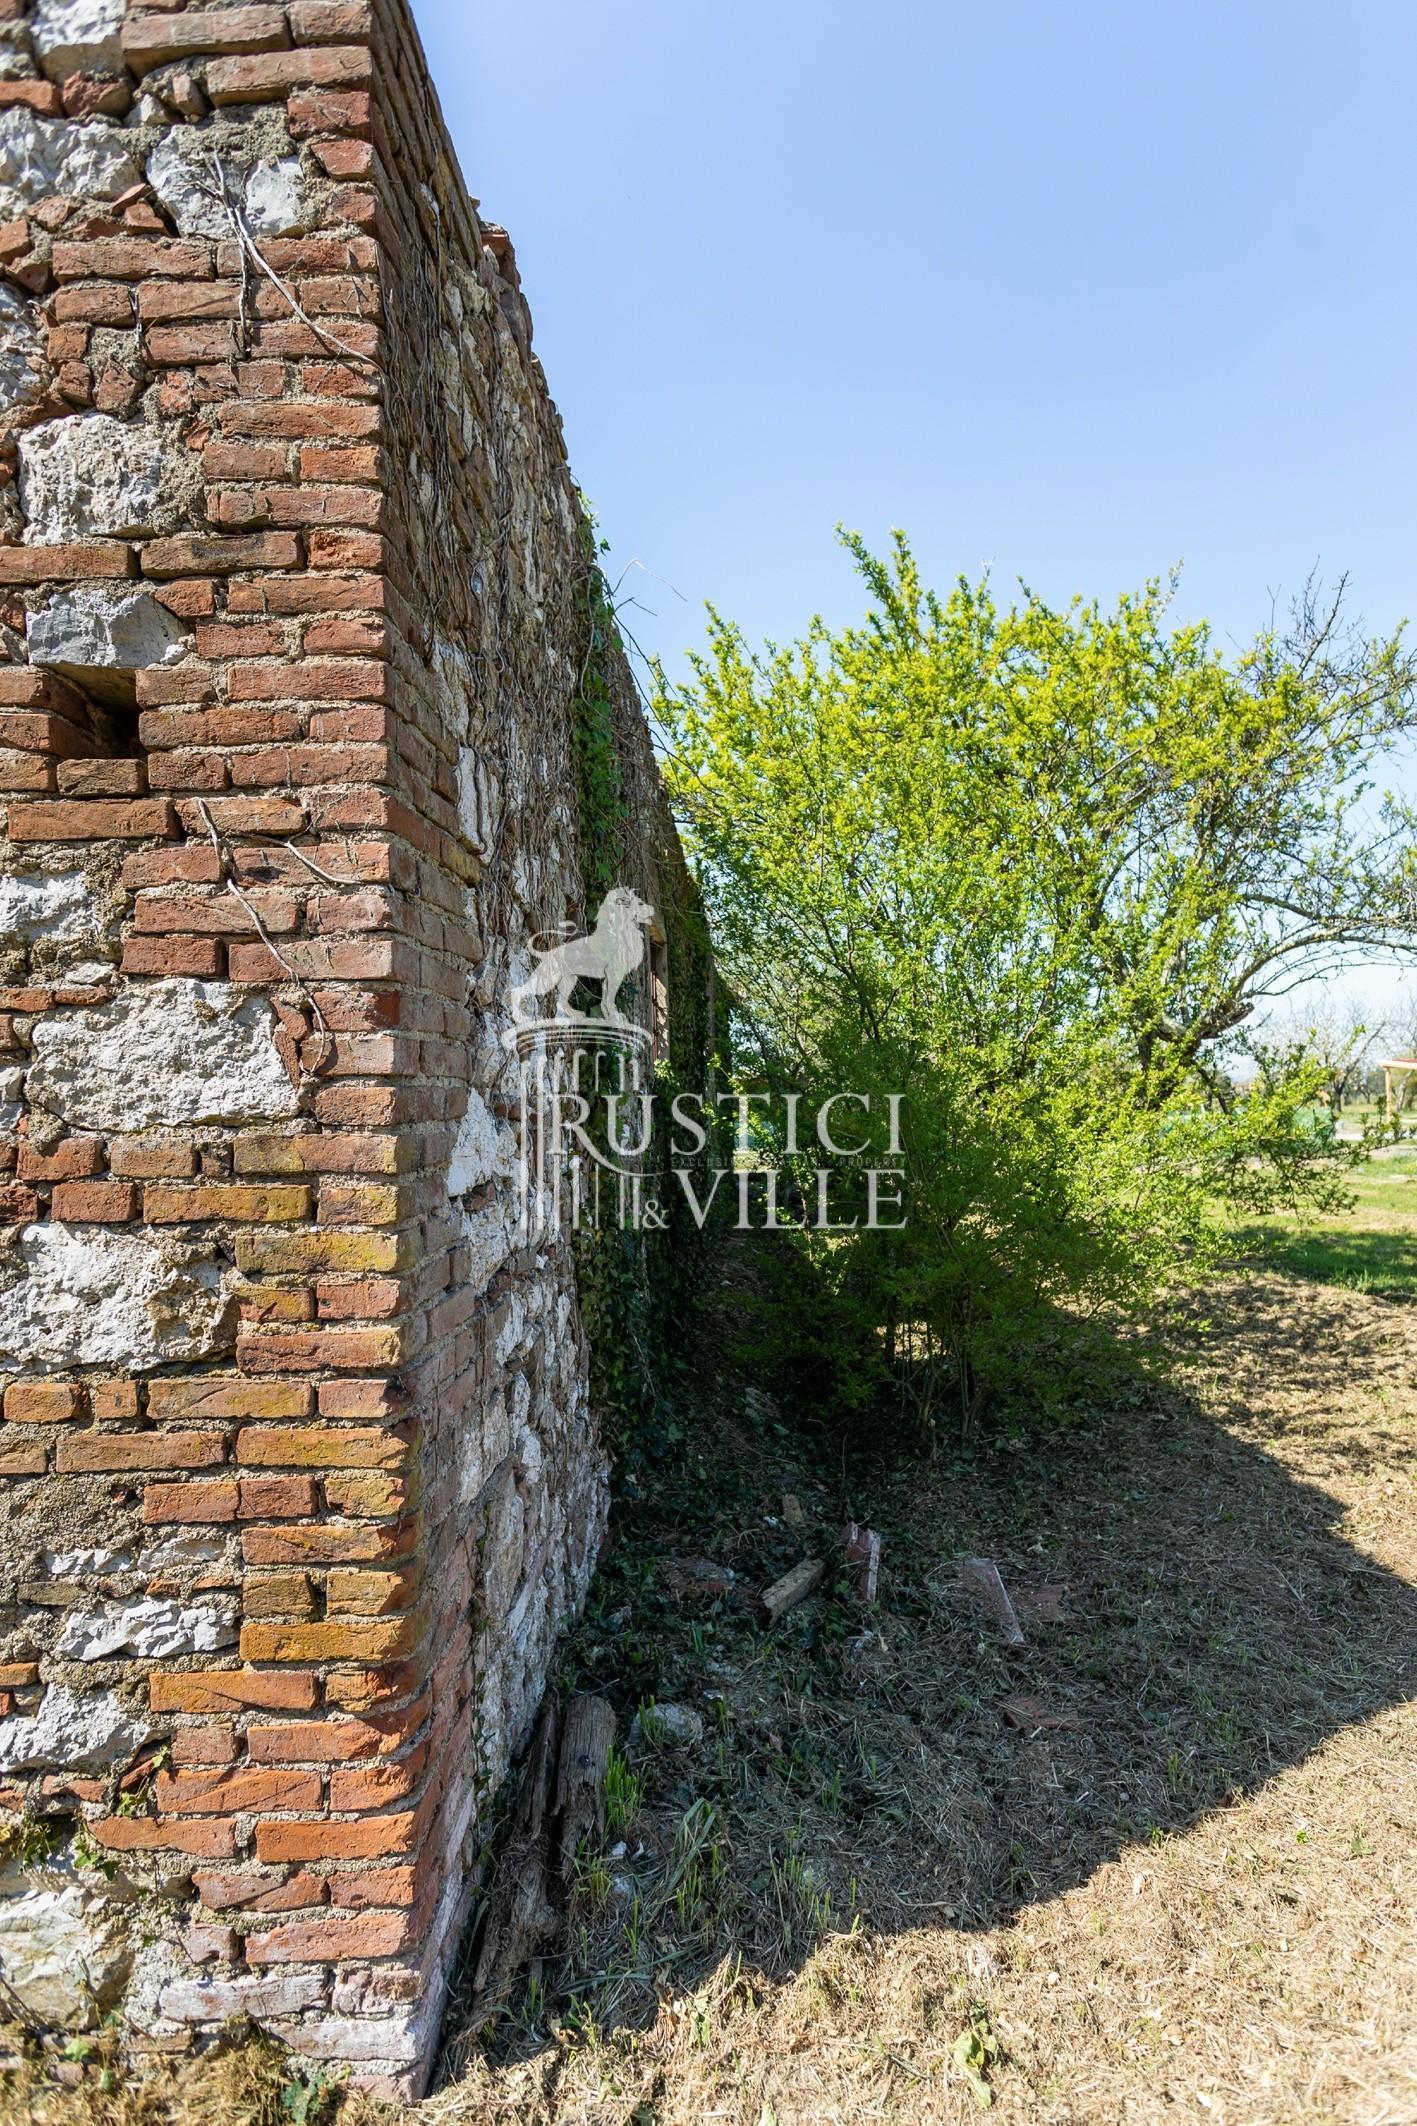 Edificio storico in vendita a San Giuliano Terme (13/81)